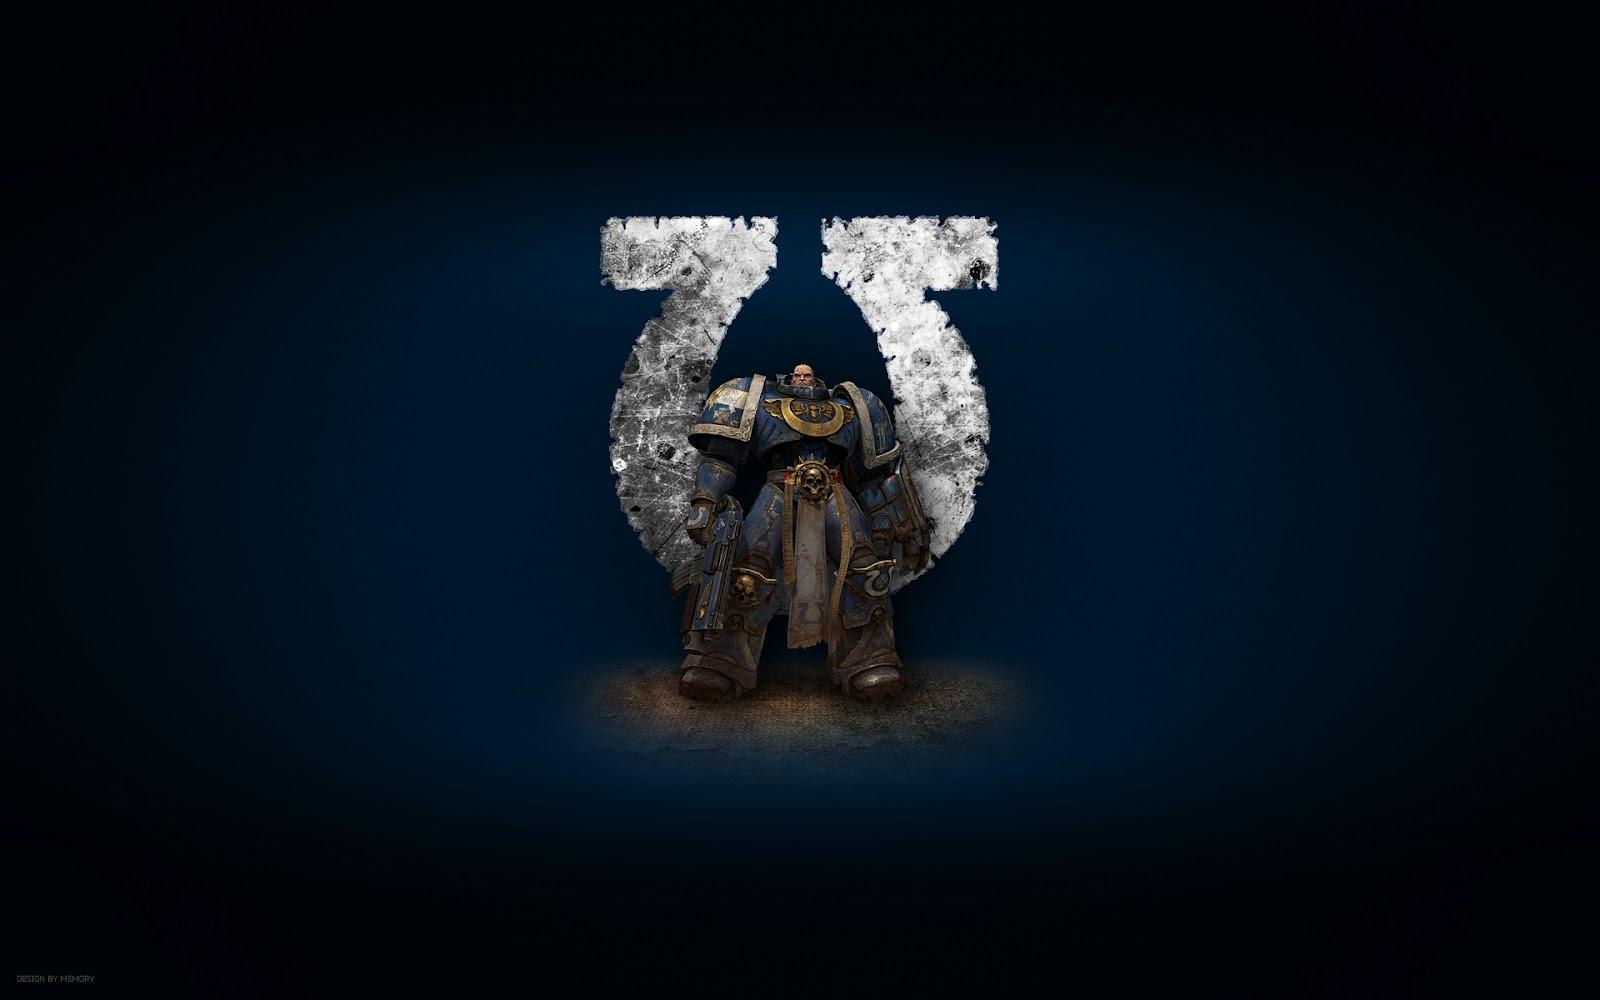 http://1.bp.blogspot.com/-pGp2a_pyaO8/UDYvSqJ56aI/AAAAAAAAAKo/gwxPf2GqnDc/s1600/Warhammer_40k_wallpaper_.jpg